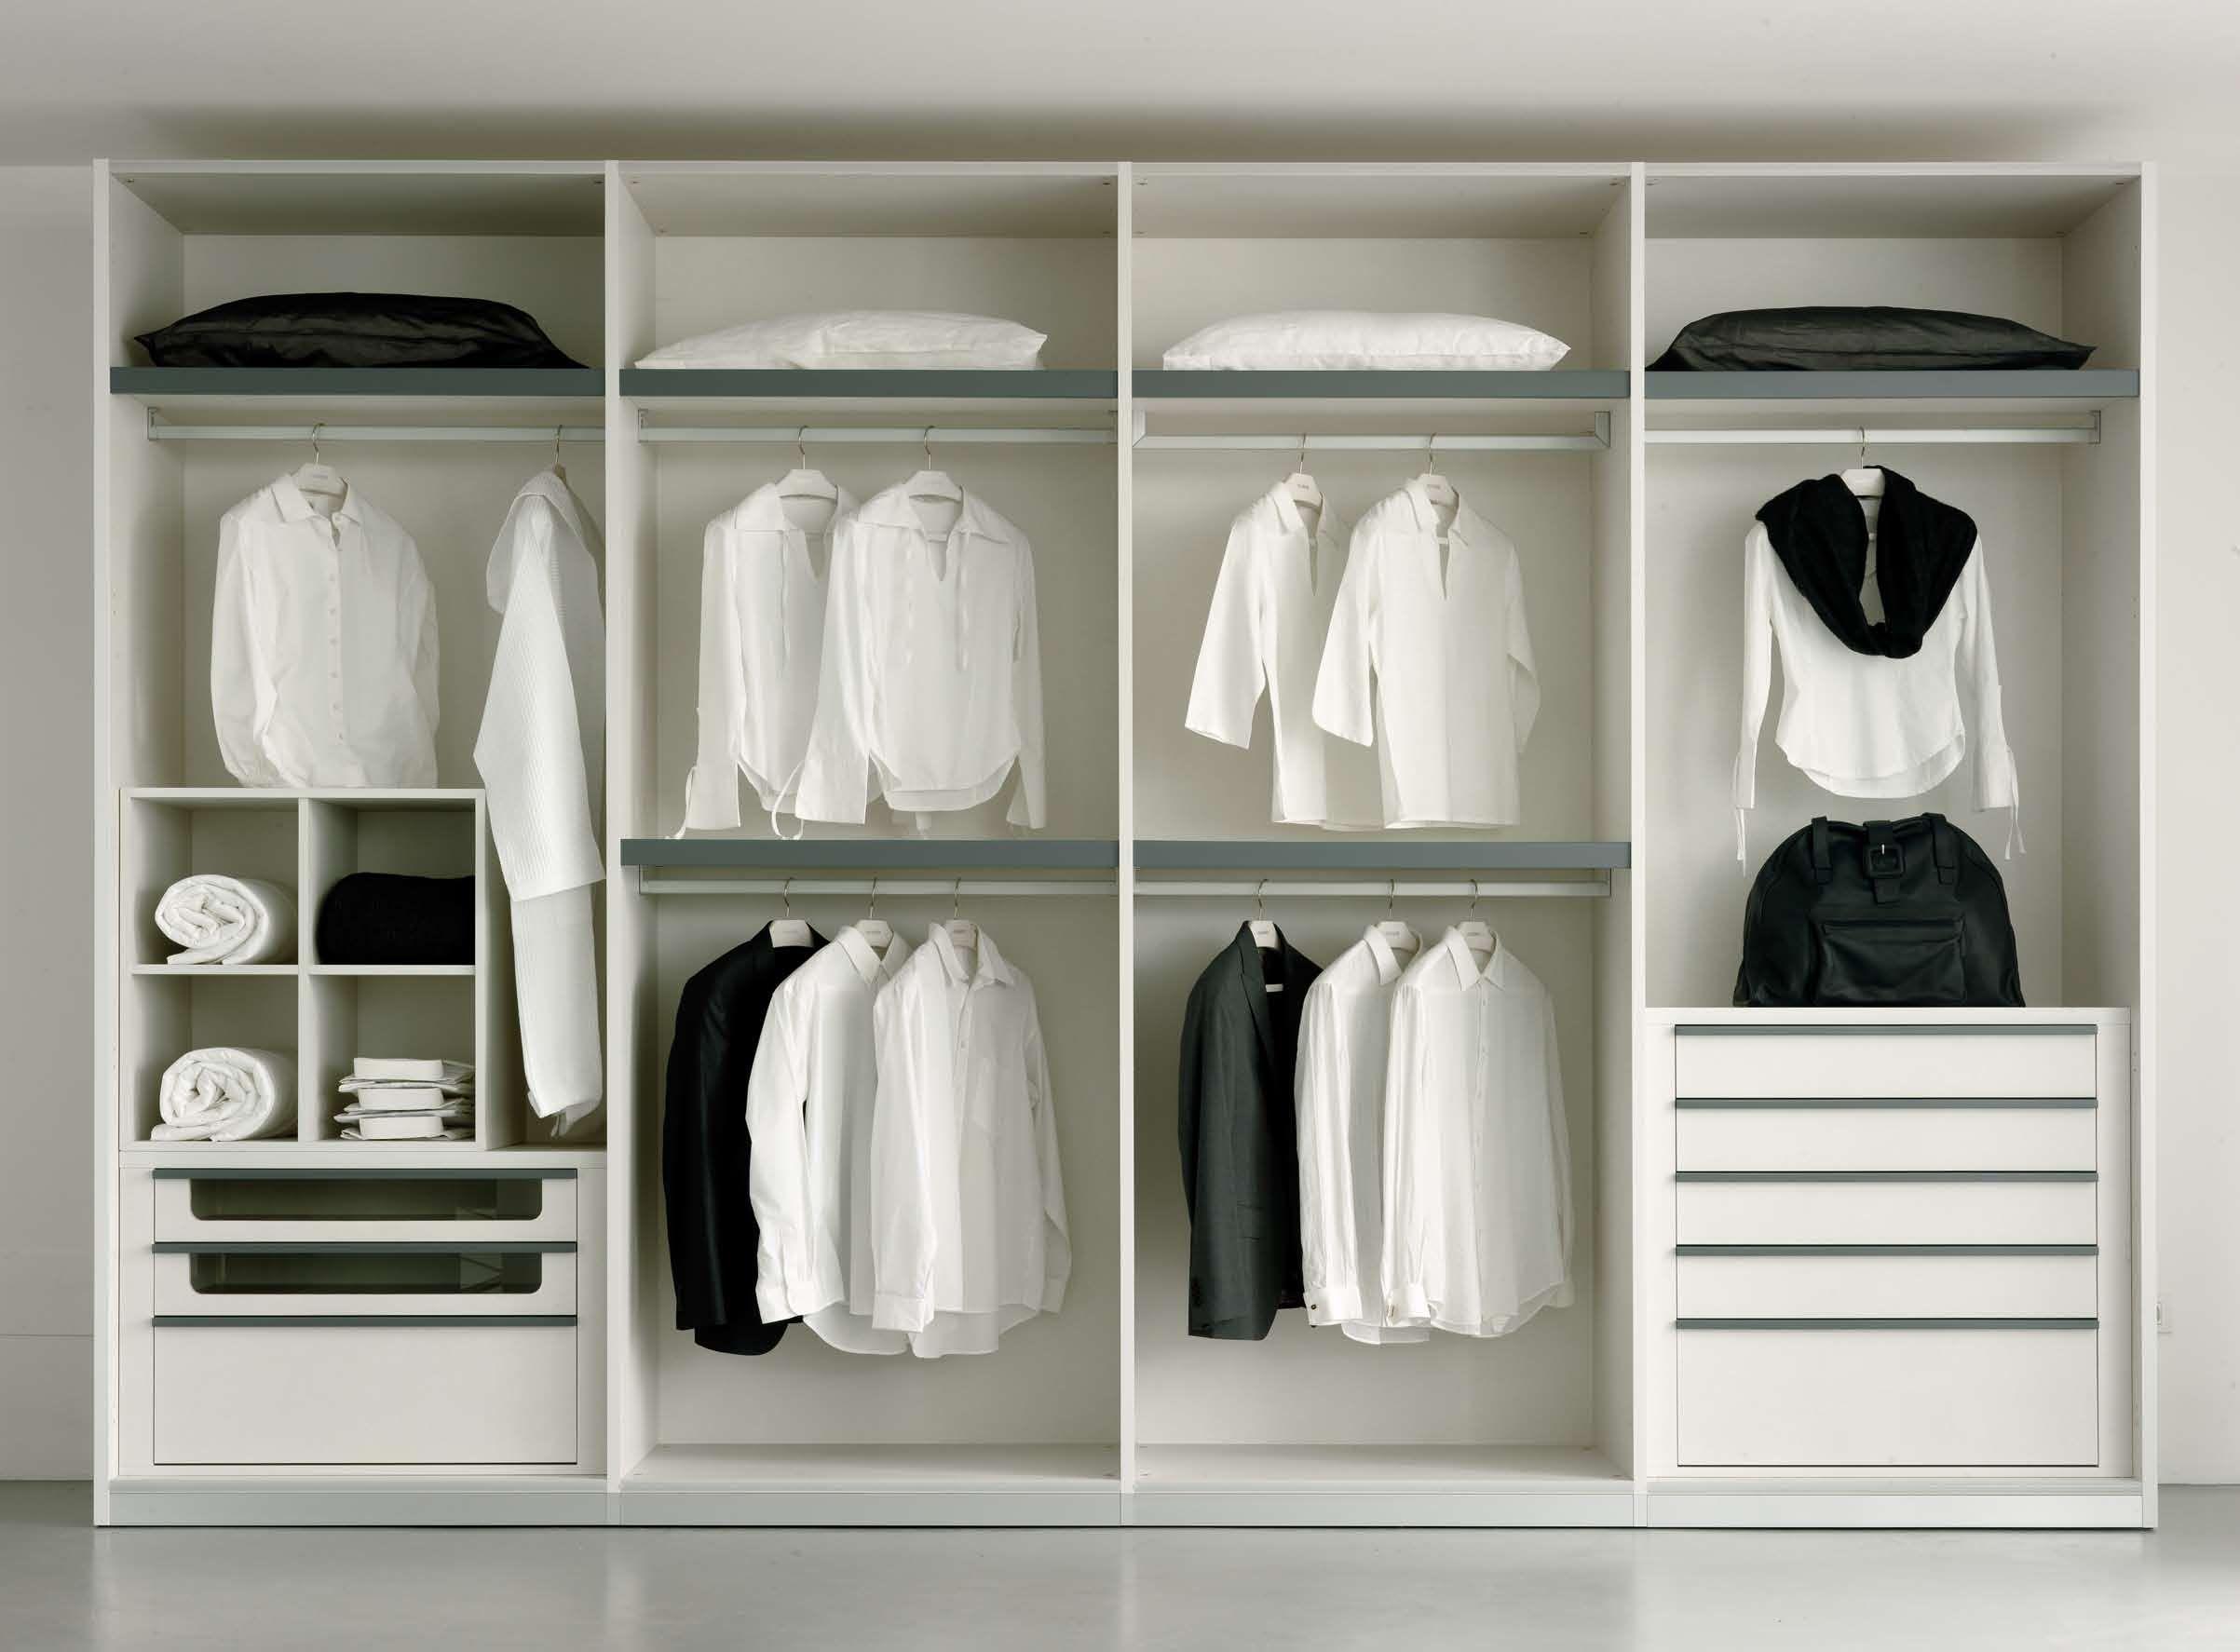 dressing 4 astuces pour optimiser votre penderie. Black Bedroom Furniture Sets. Home Design Ideas